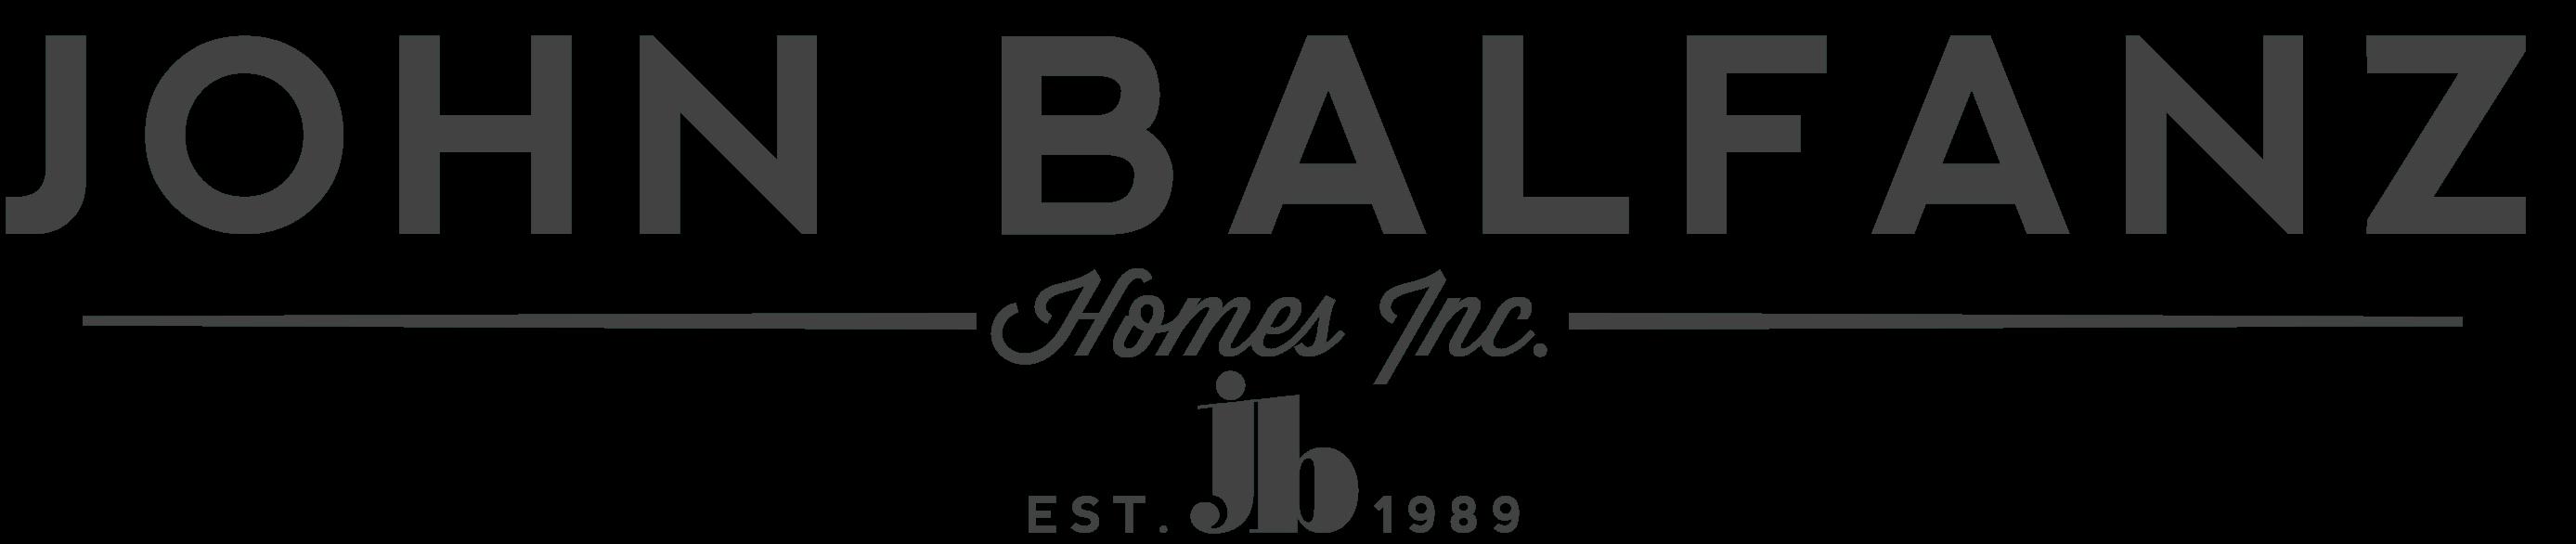 John Balfanz Homes